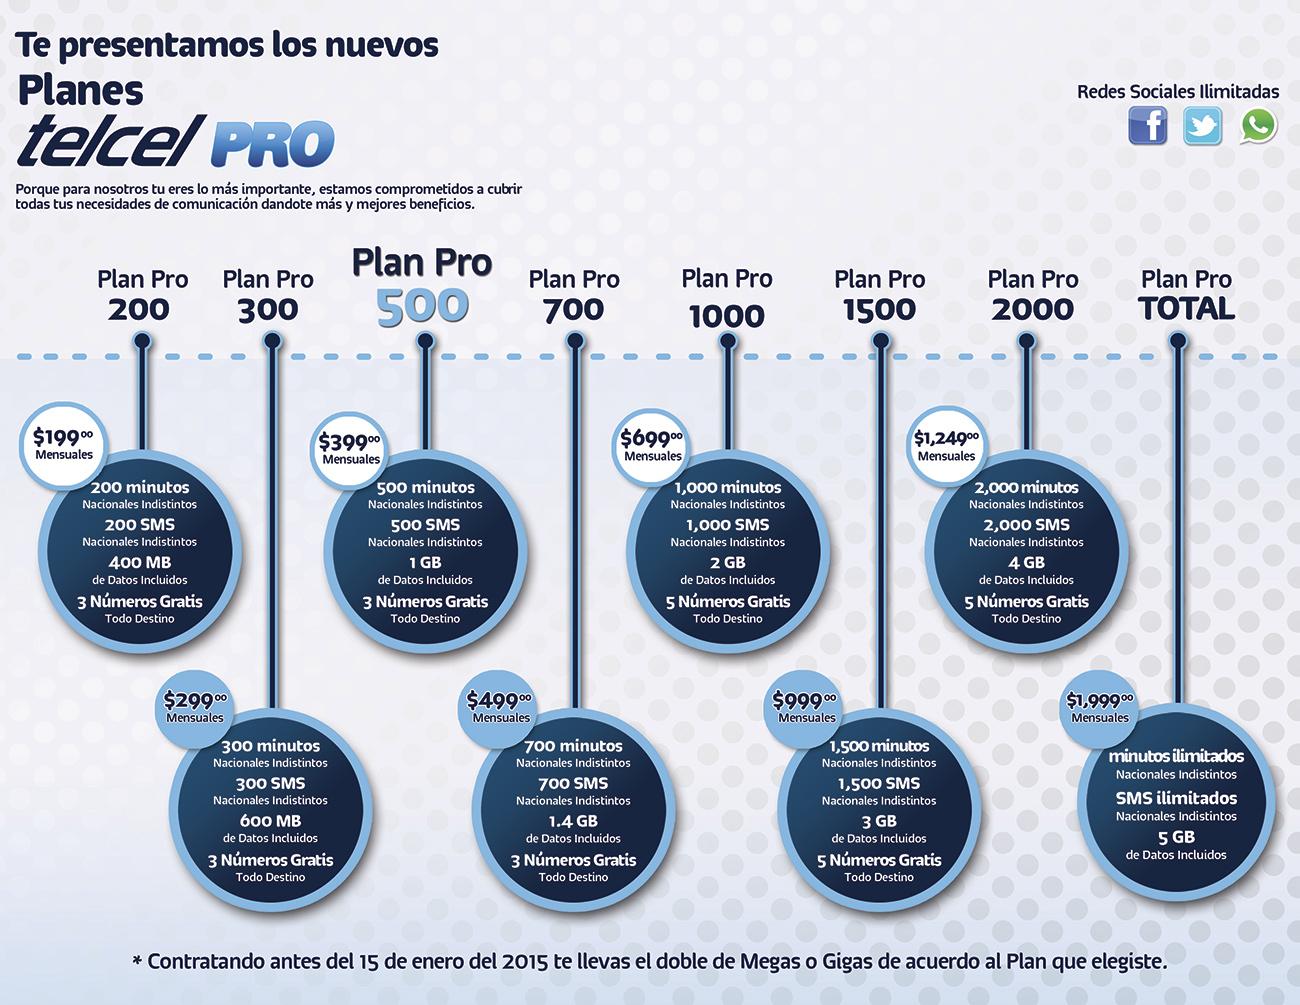 Planes Telcel Pro